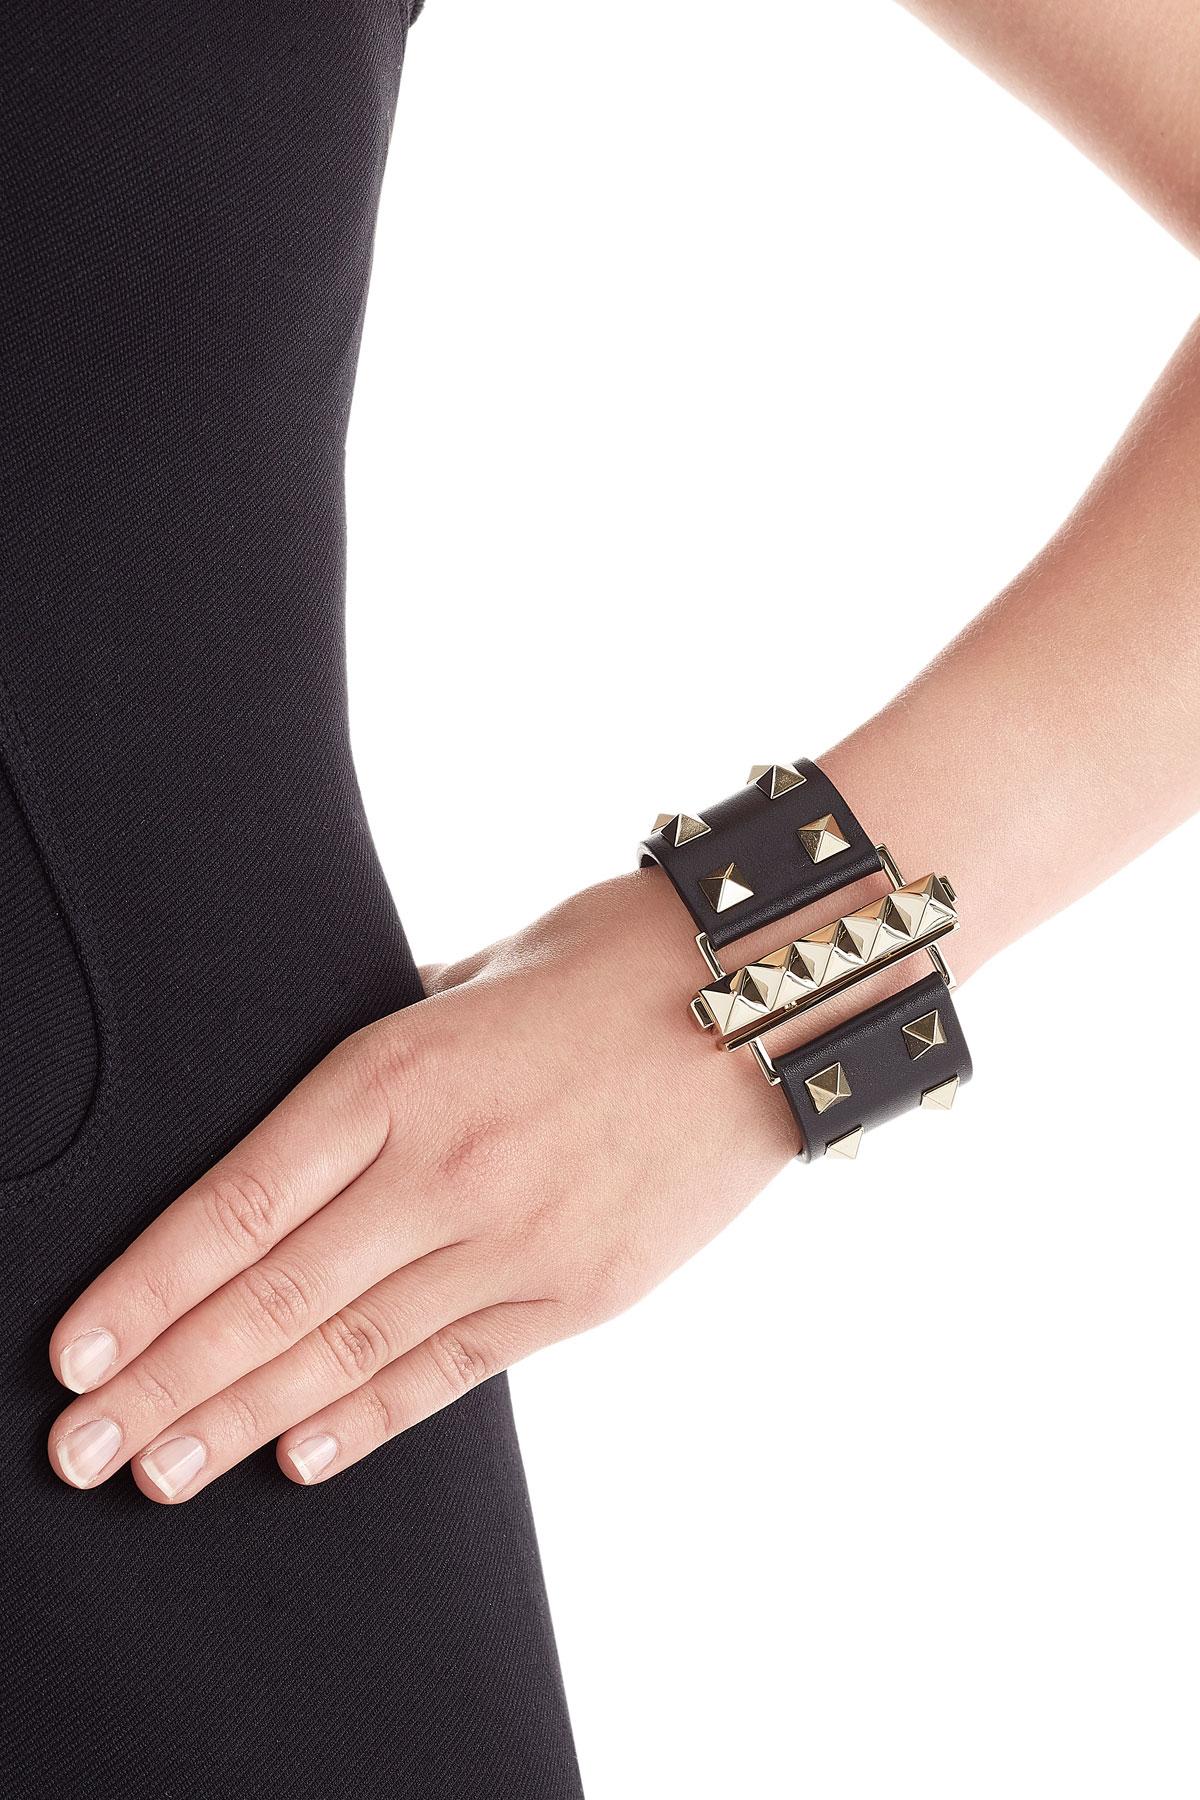 Valentino Rockstud Leather Cuff Bracelet r52eB